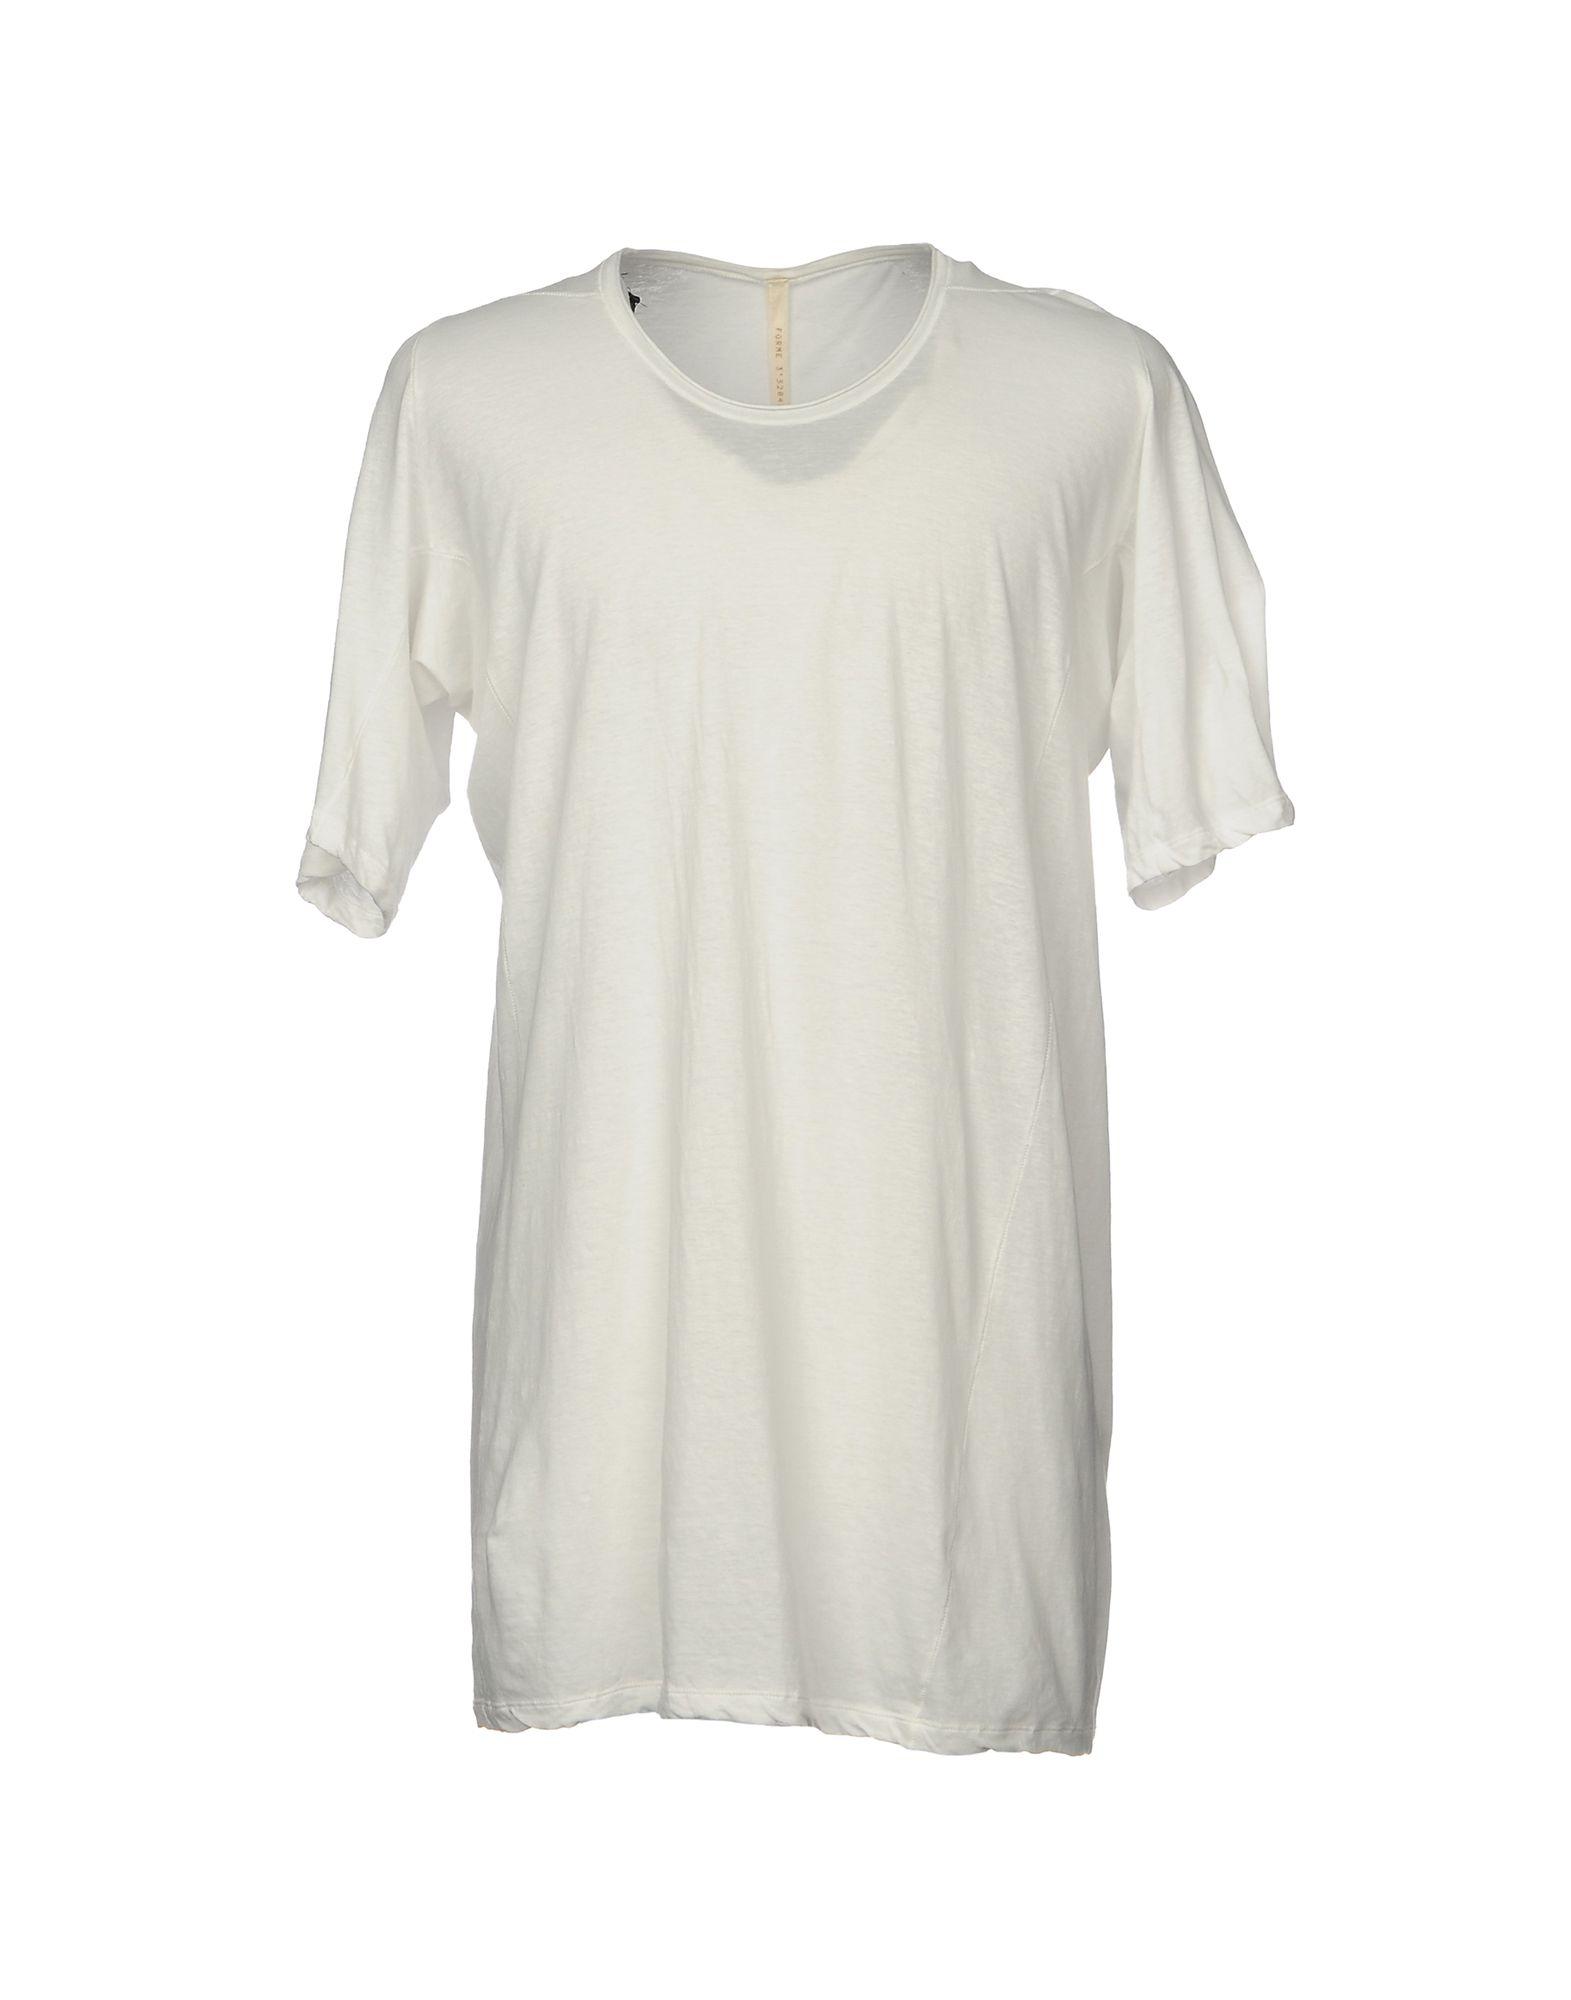 T-Shirt Forme Dexpression Uomo - Acquista online su